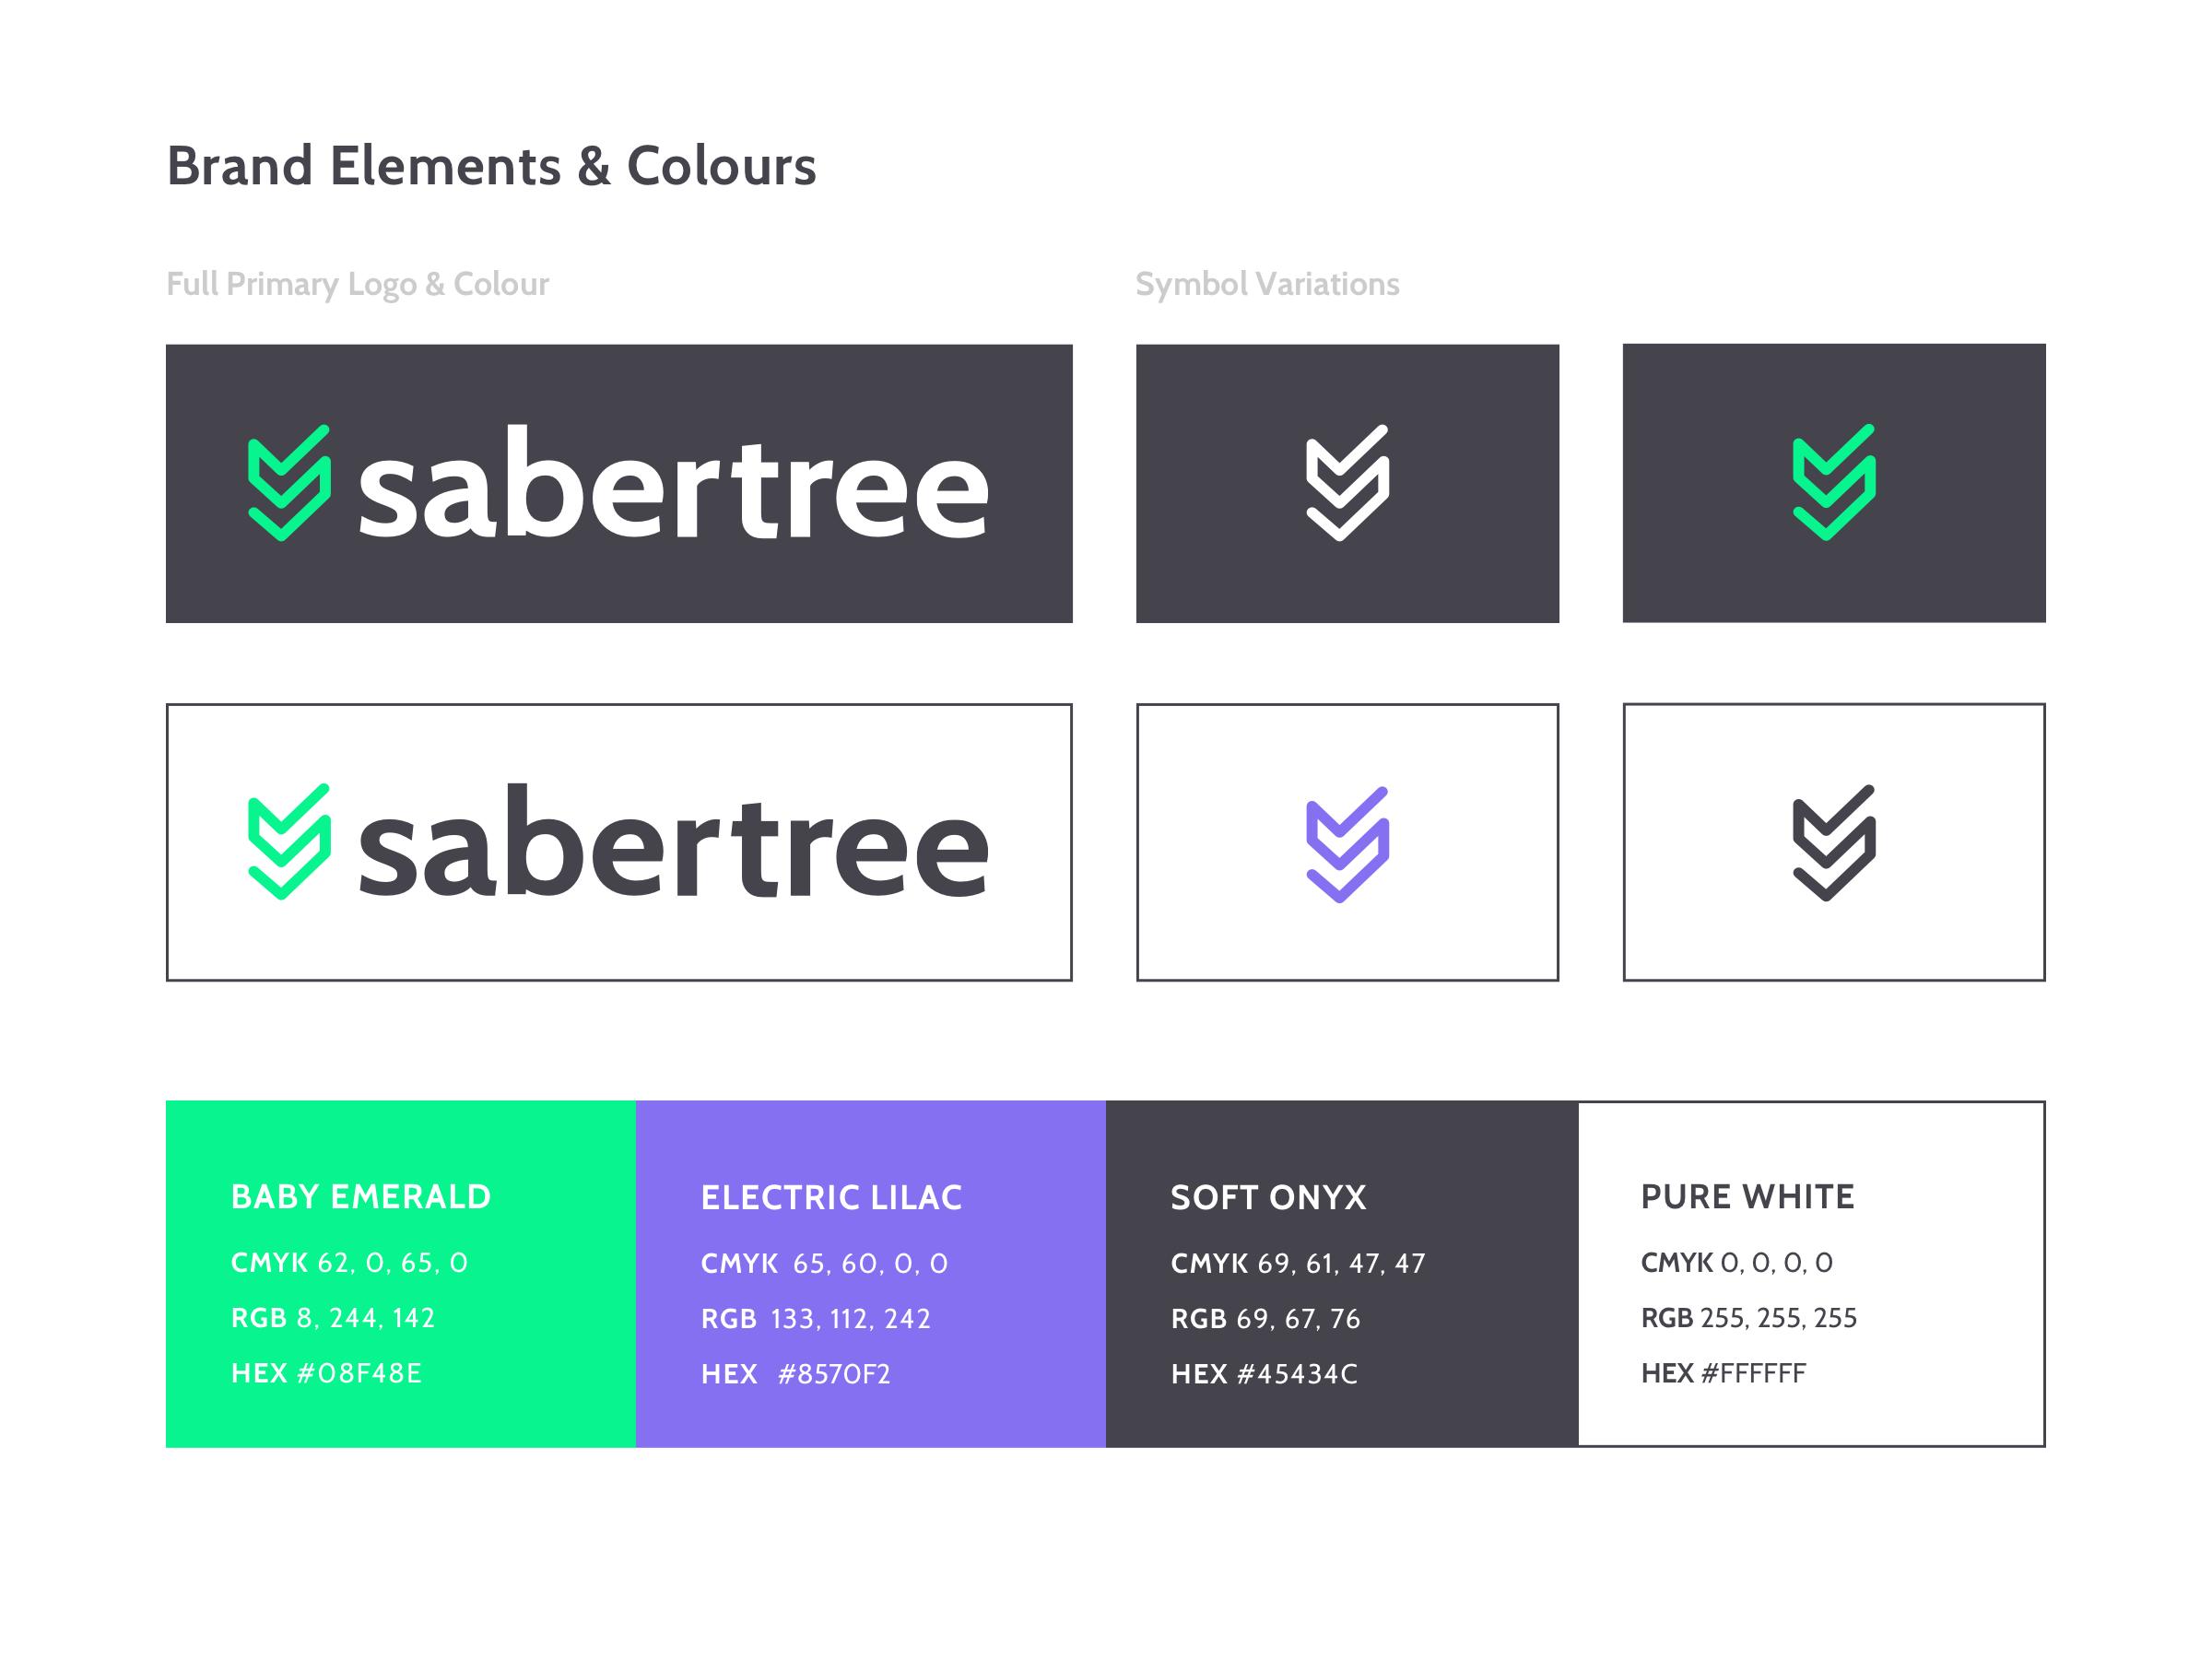 Brand Elements